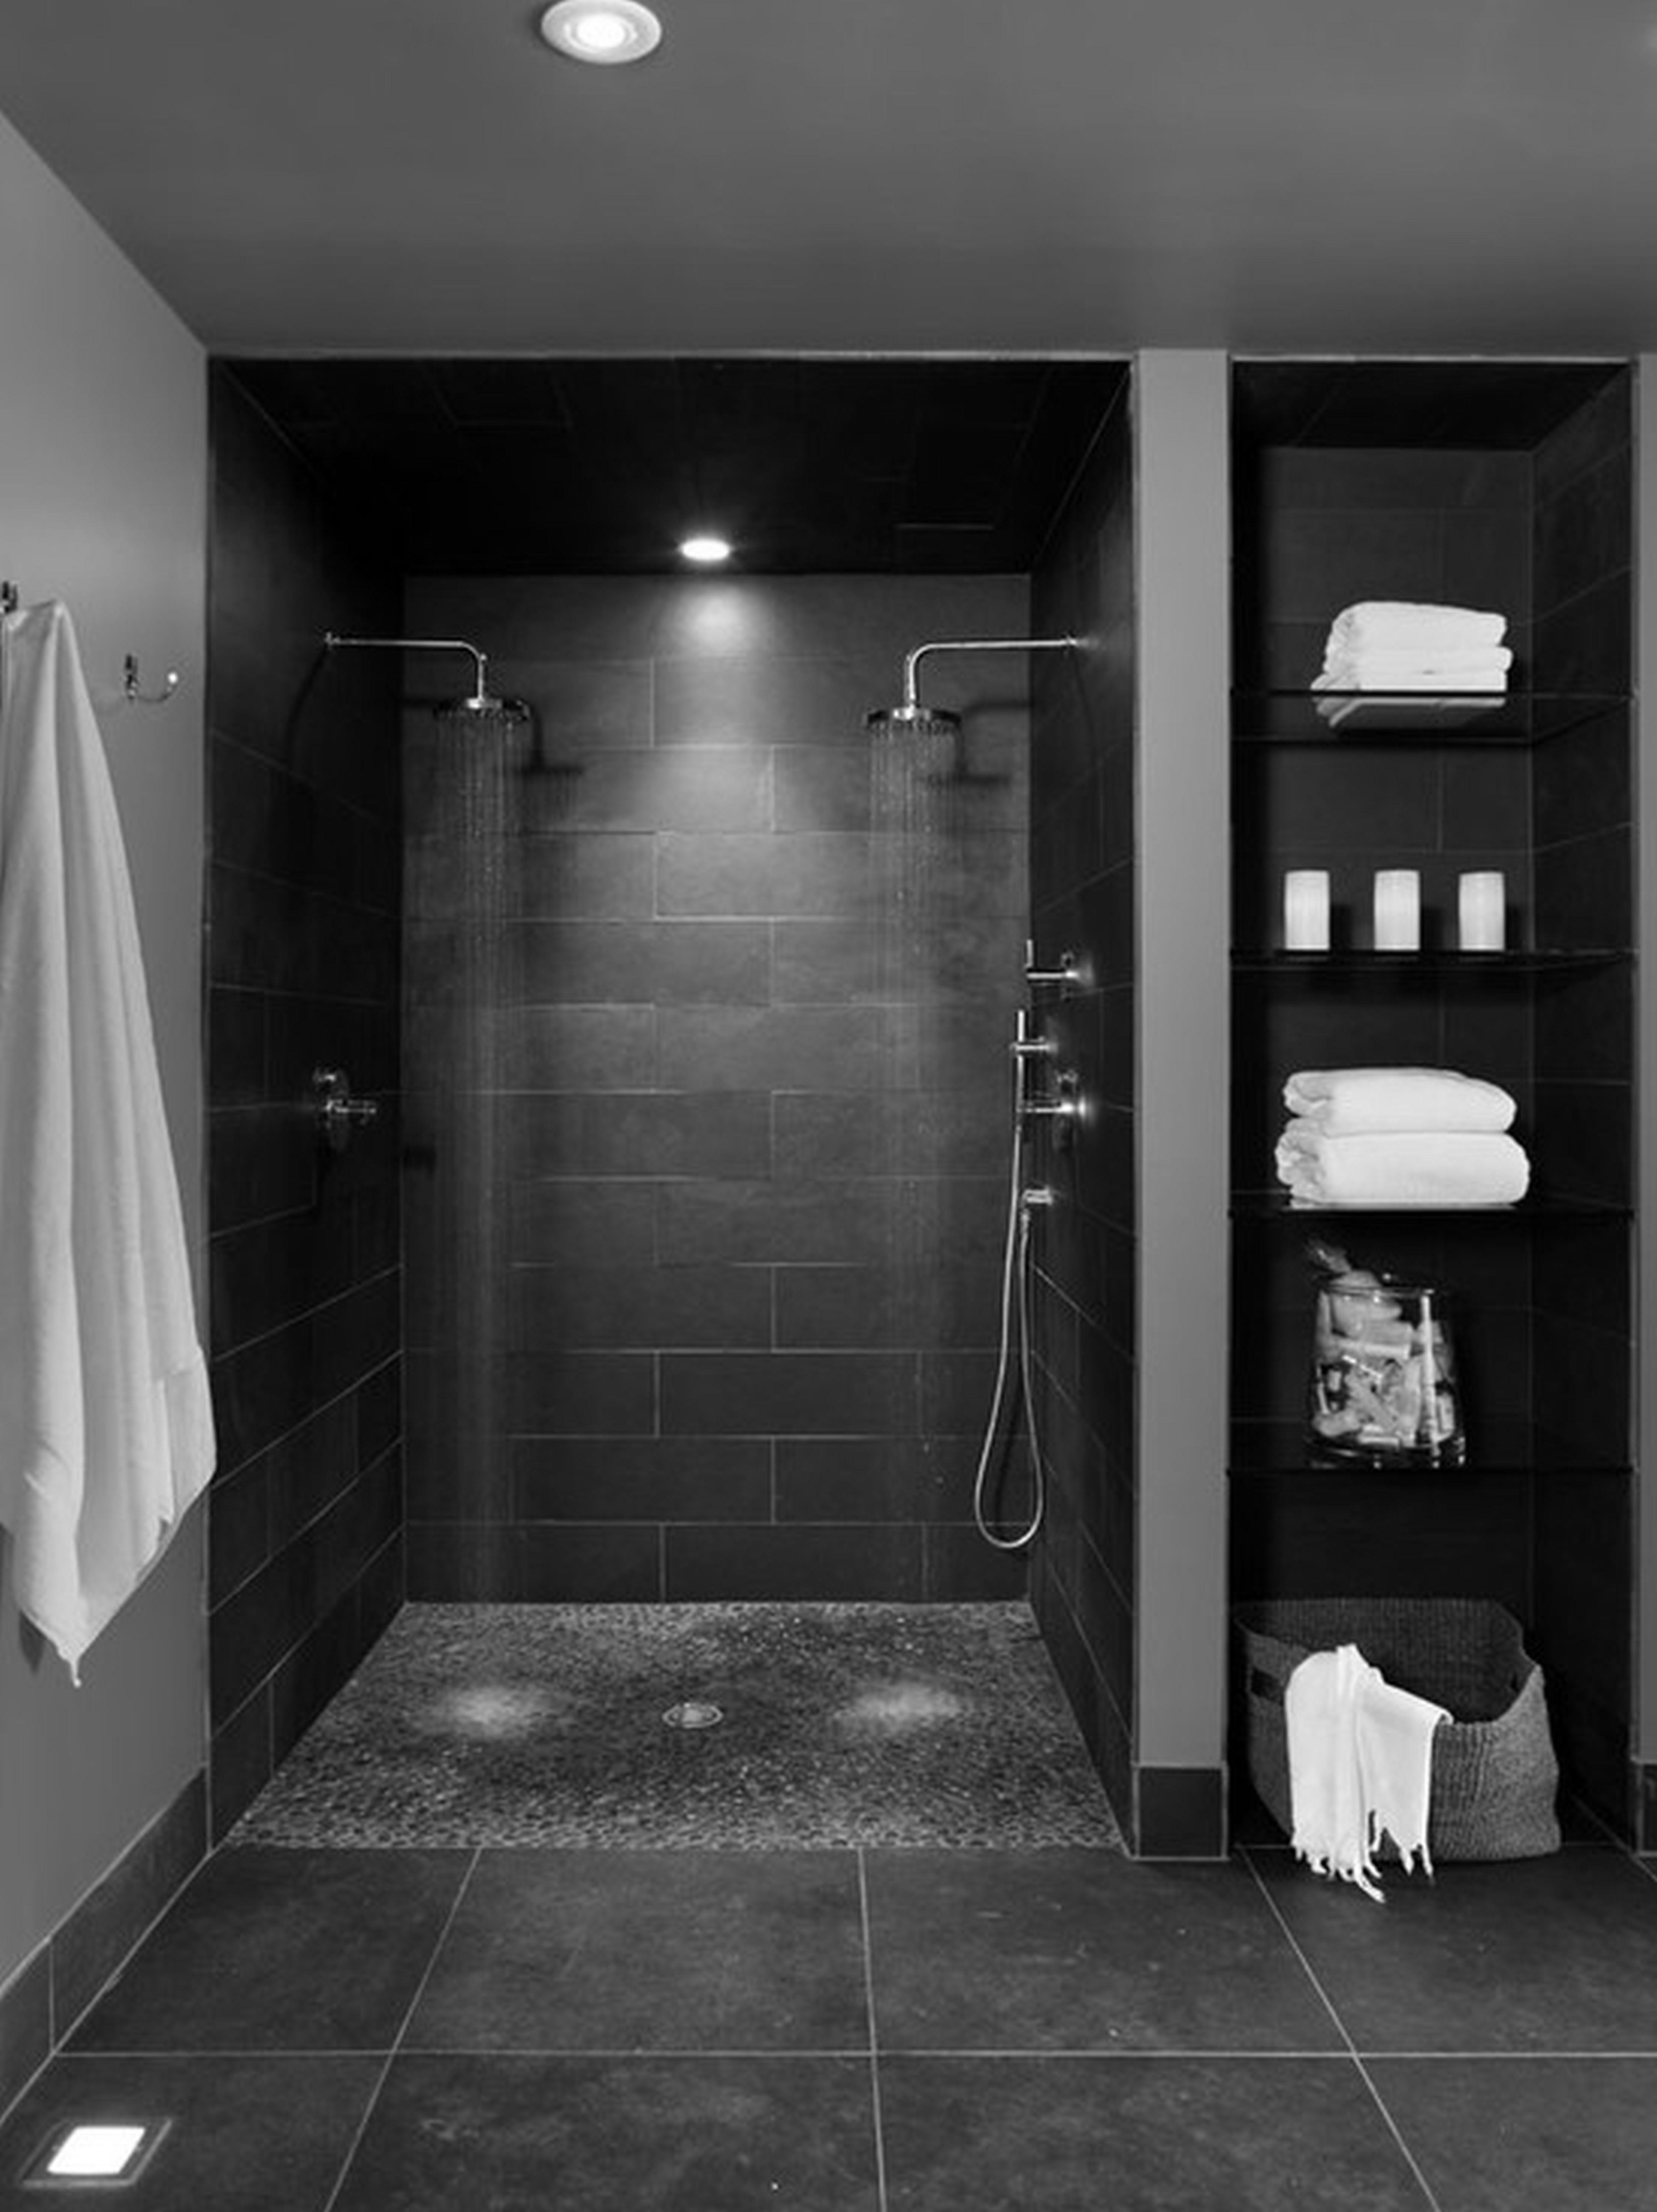 Double Shower Spa Bathroom Design Bathroom Interior Design Bathroom Design